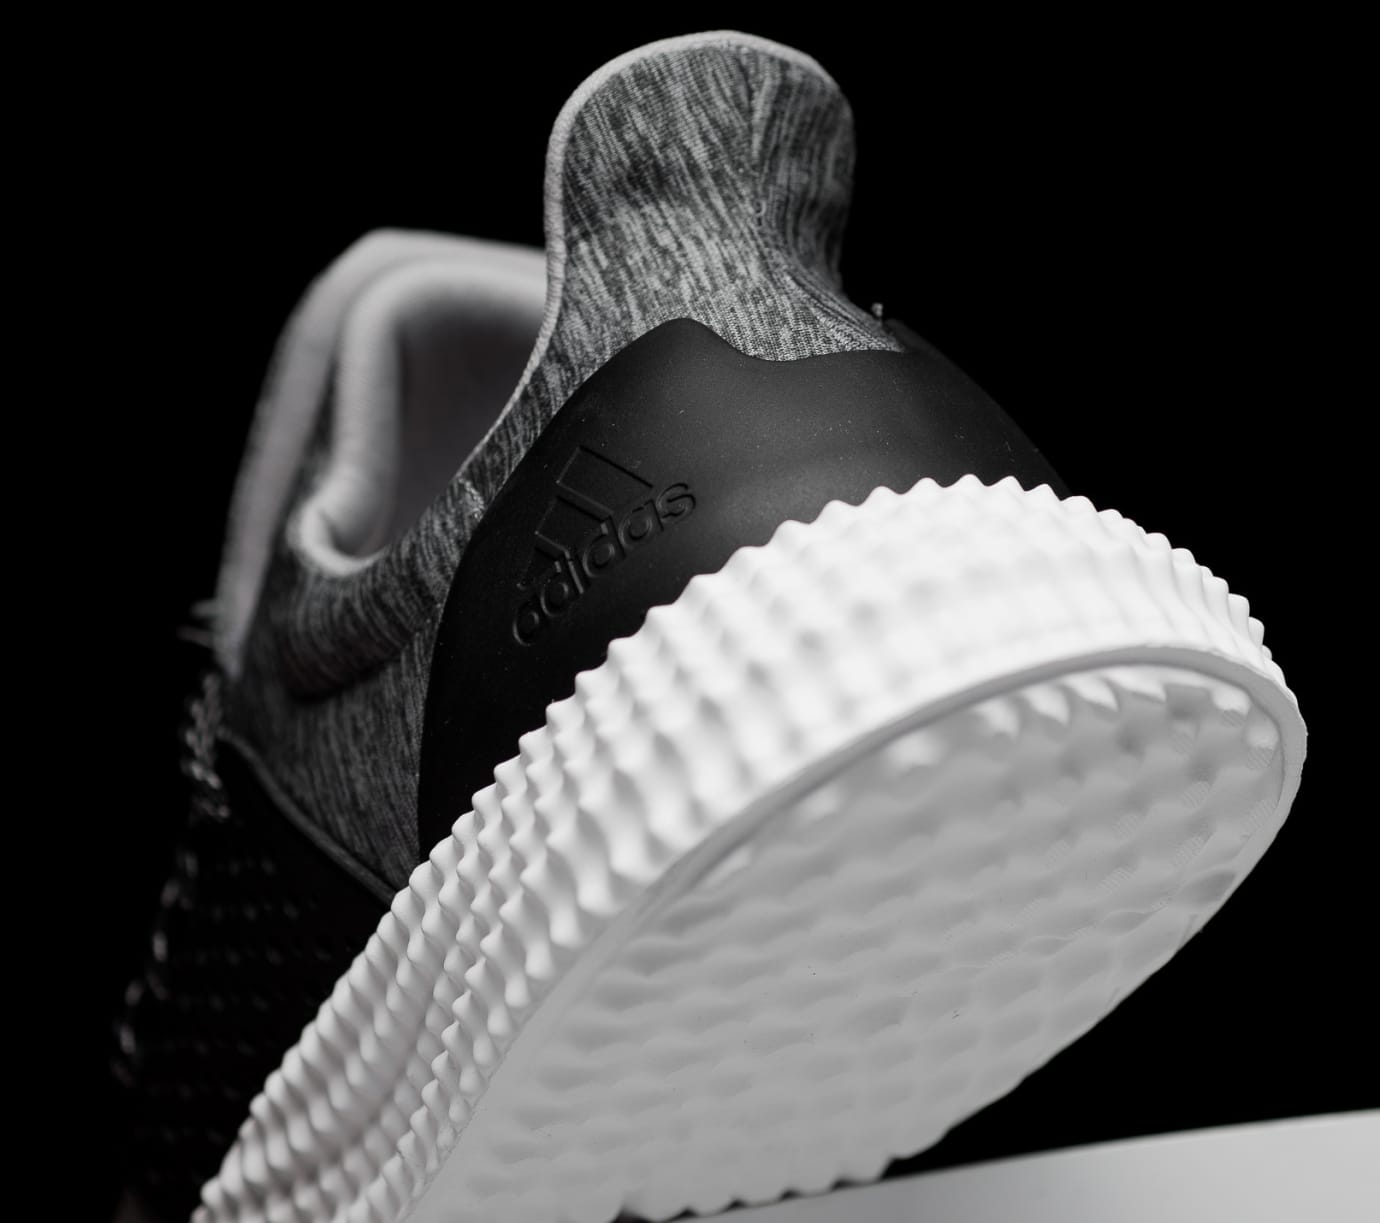 Adidas 24/7 Trainer